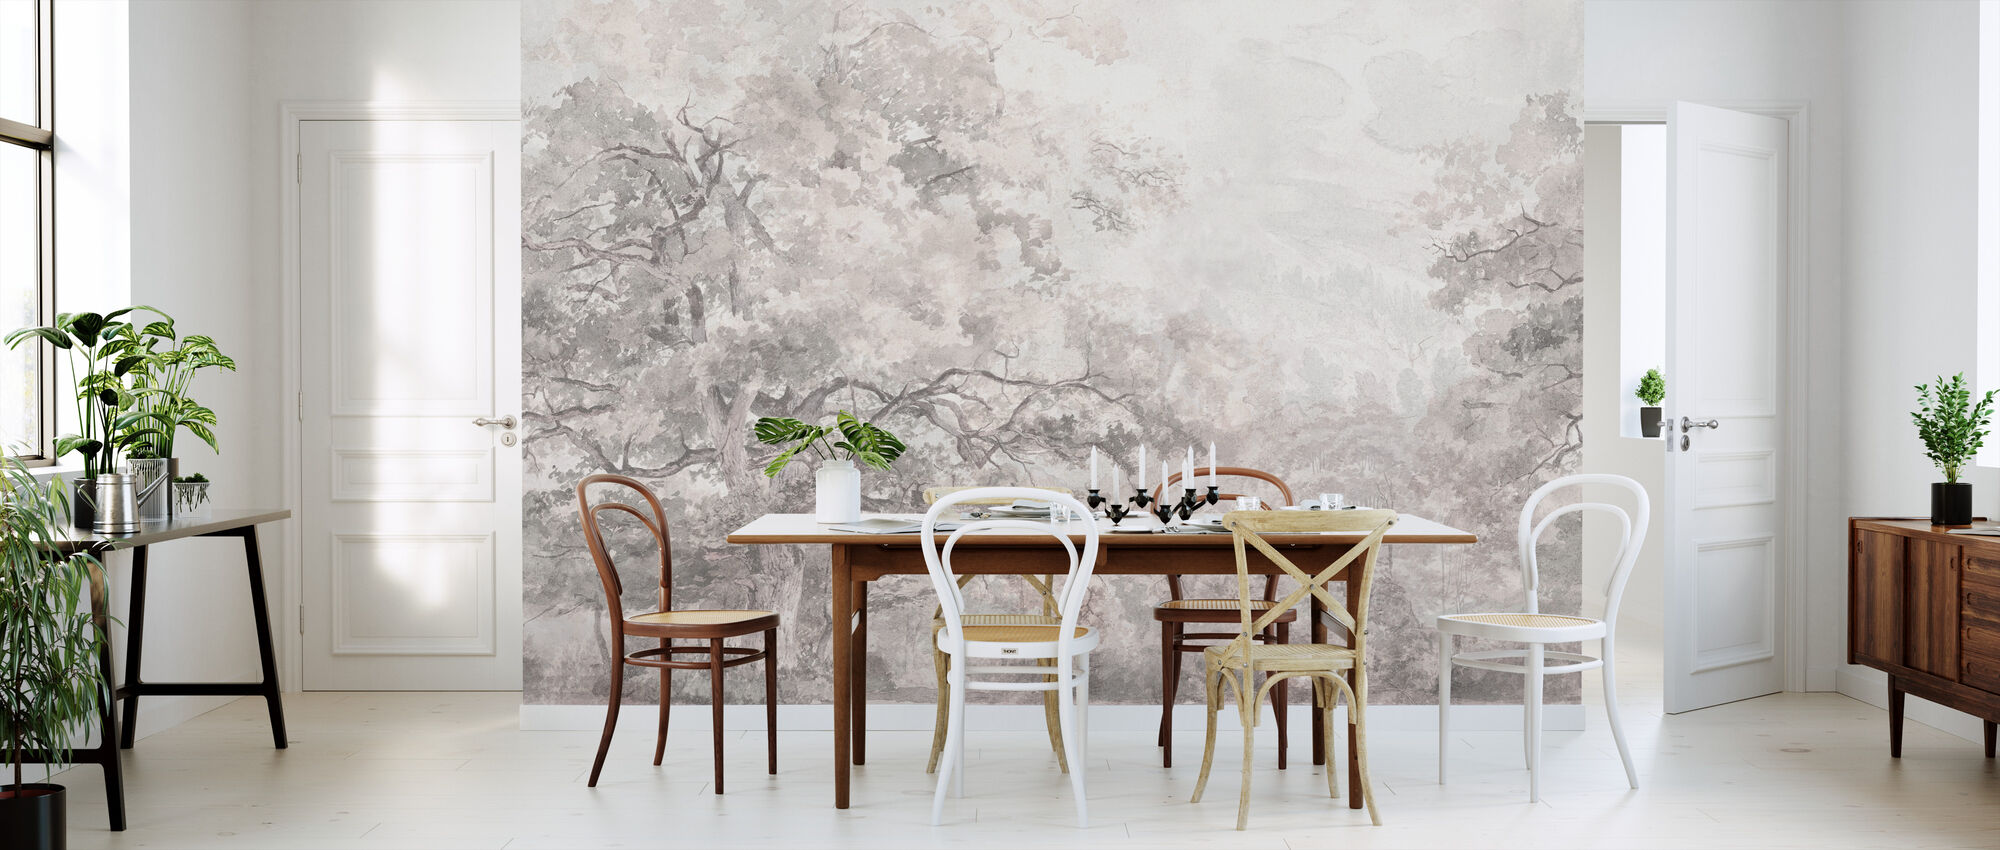 Beauty Everywhere - Pink - Wallpaper - Kitchen